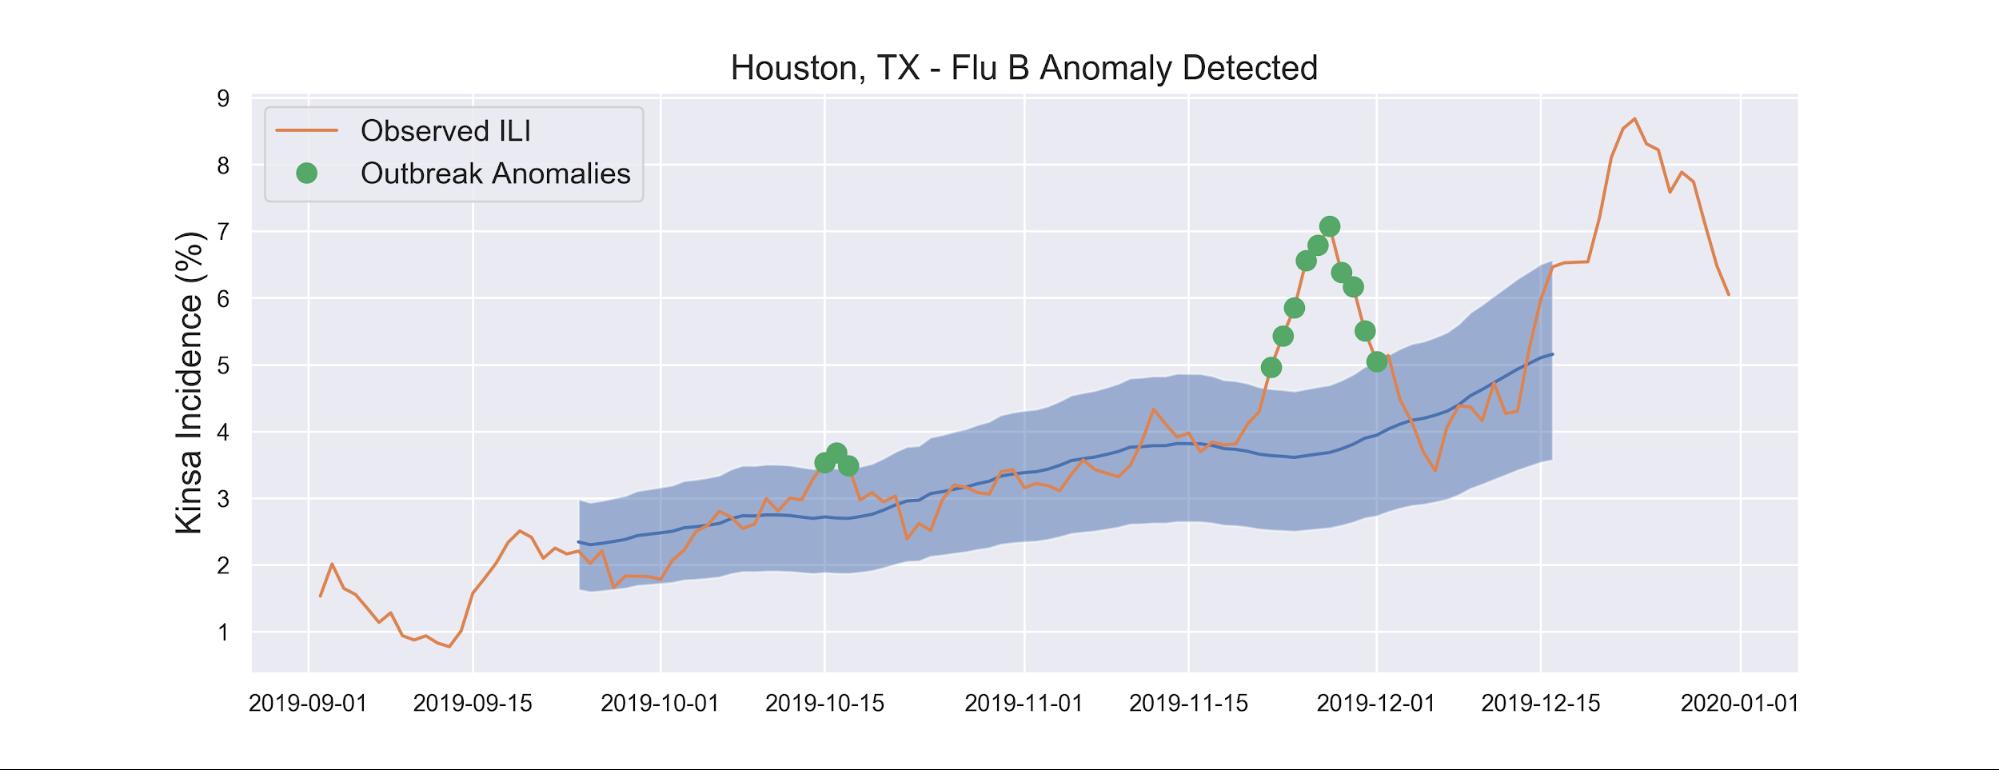 Houston, TX - Flu B Anomaly Detected